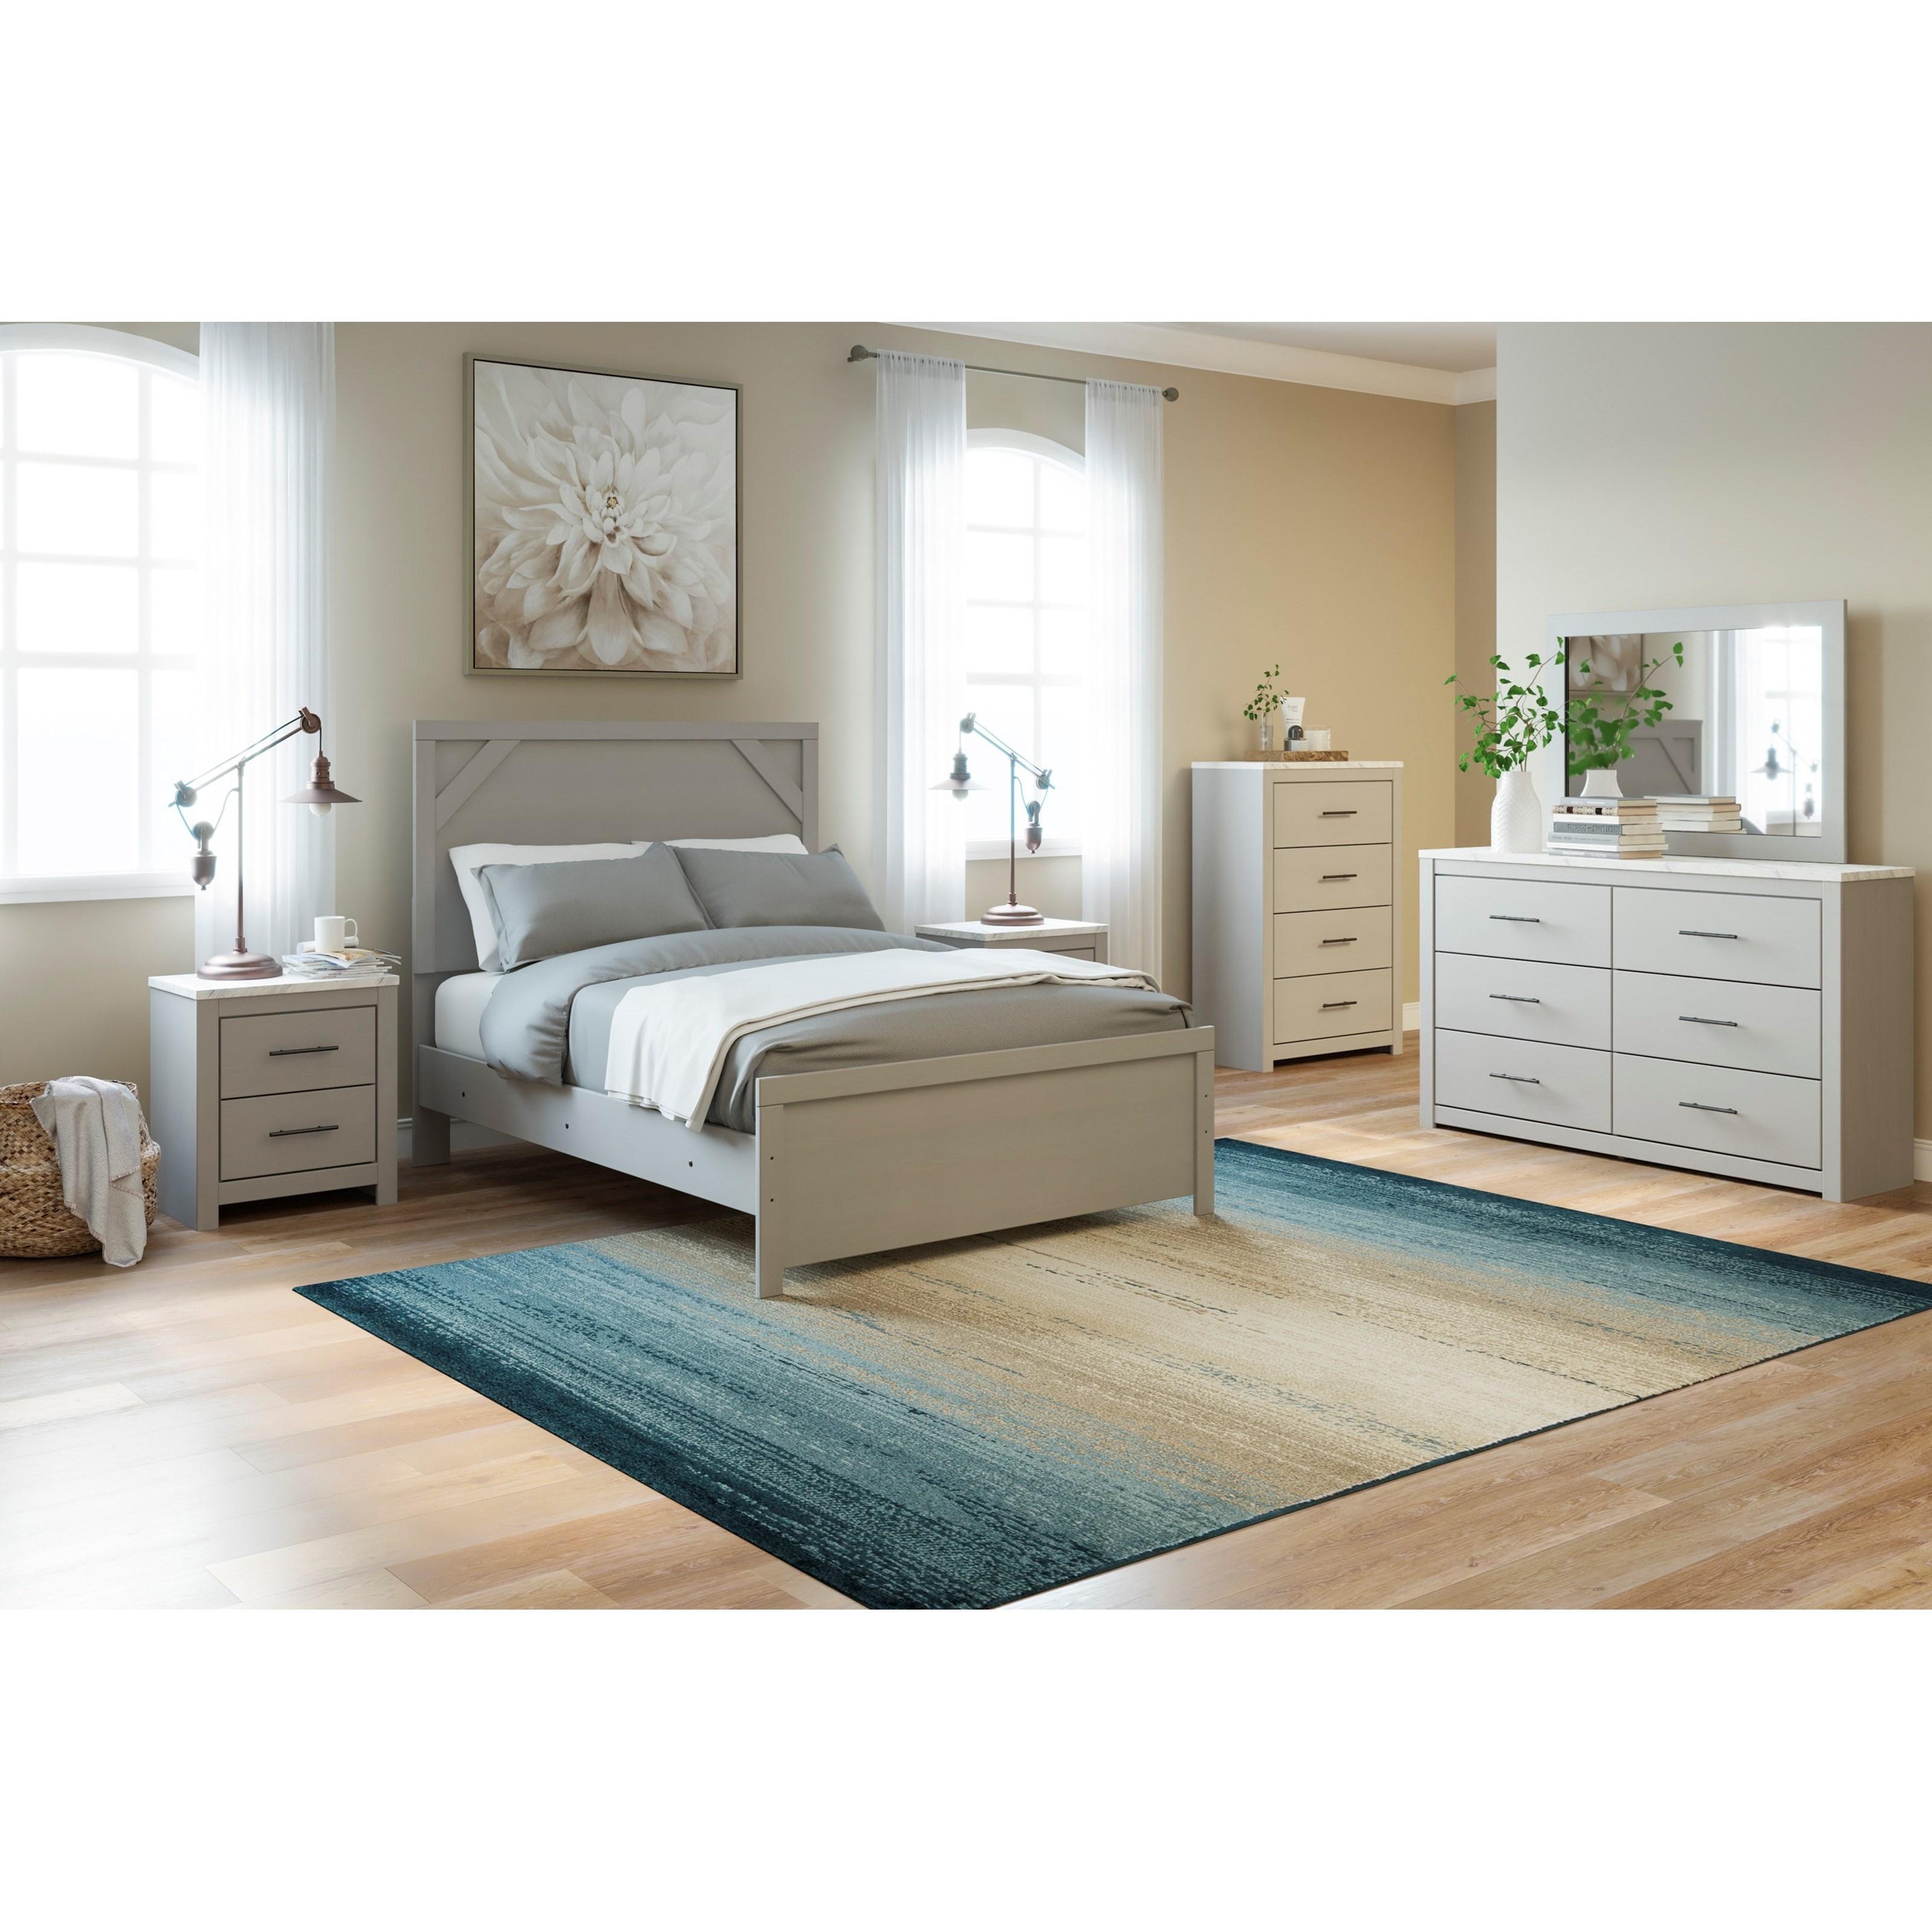 Cottenburg Full Bedroom Group by Ashley (Signature Design) at Johnny Janosik